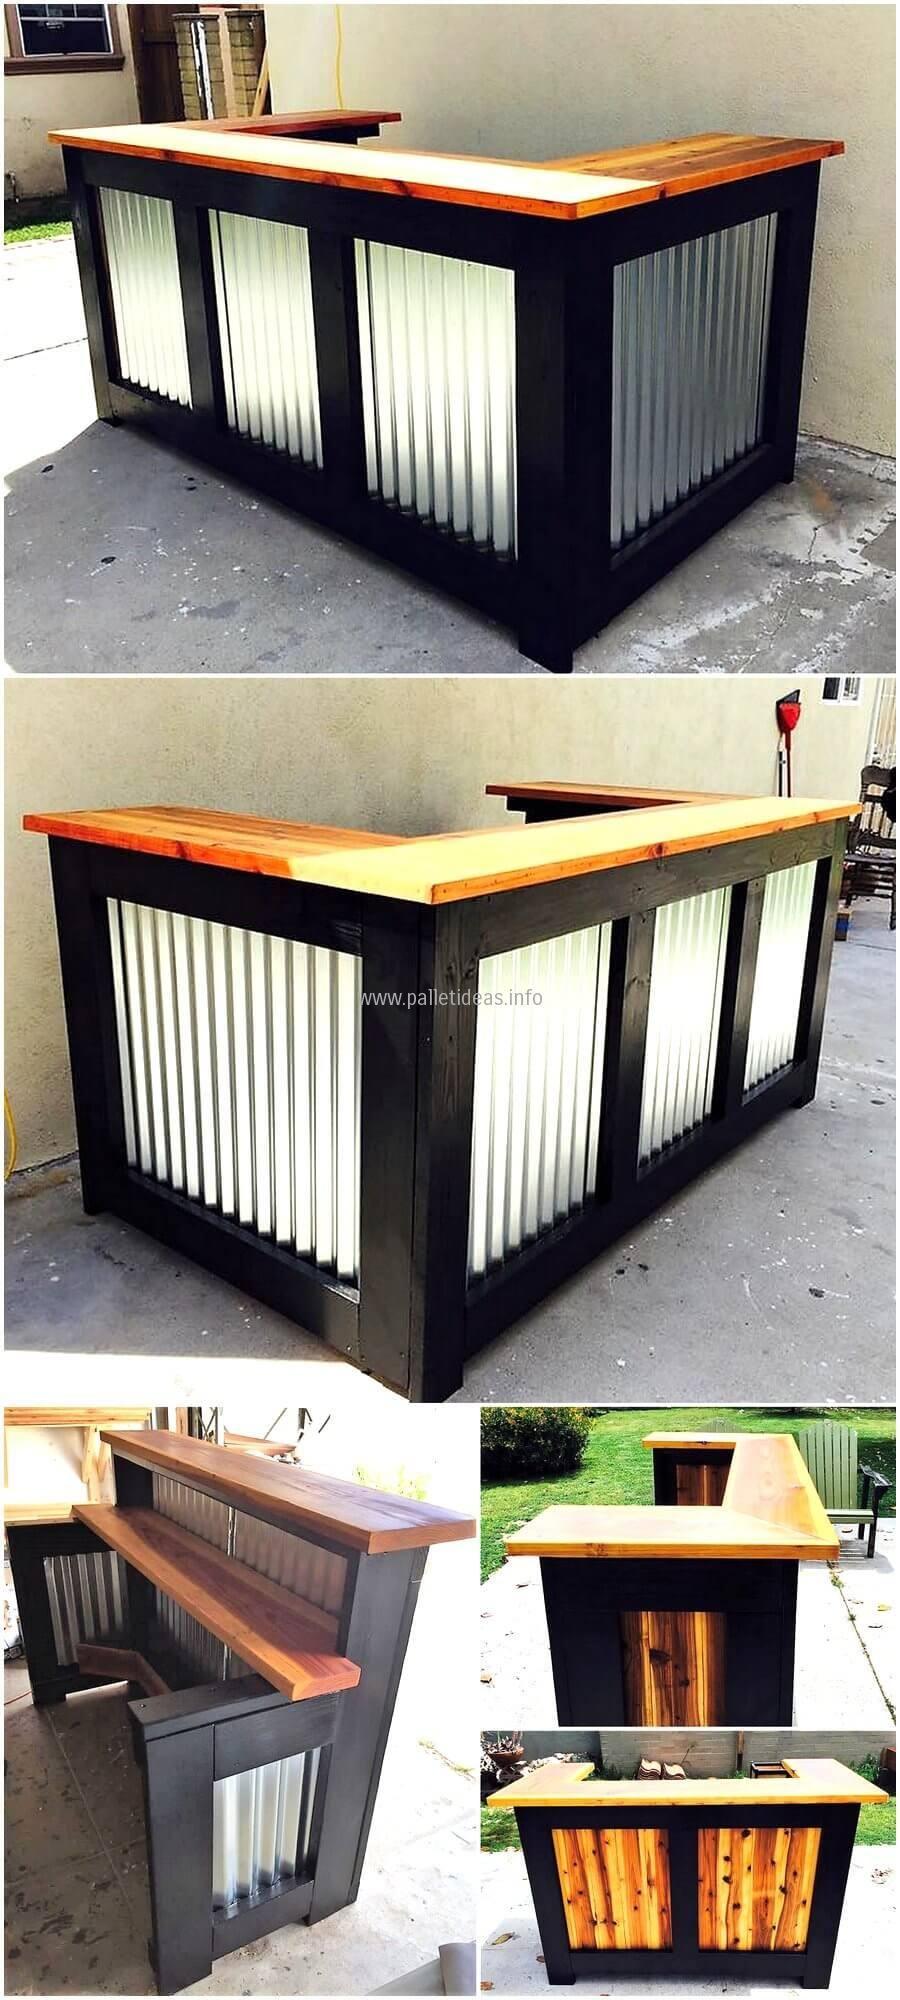 Reclaimed wooden pallet bar idea wooden pallets pallets and bar